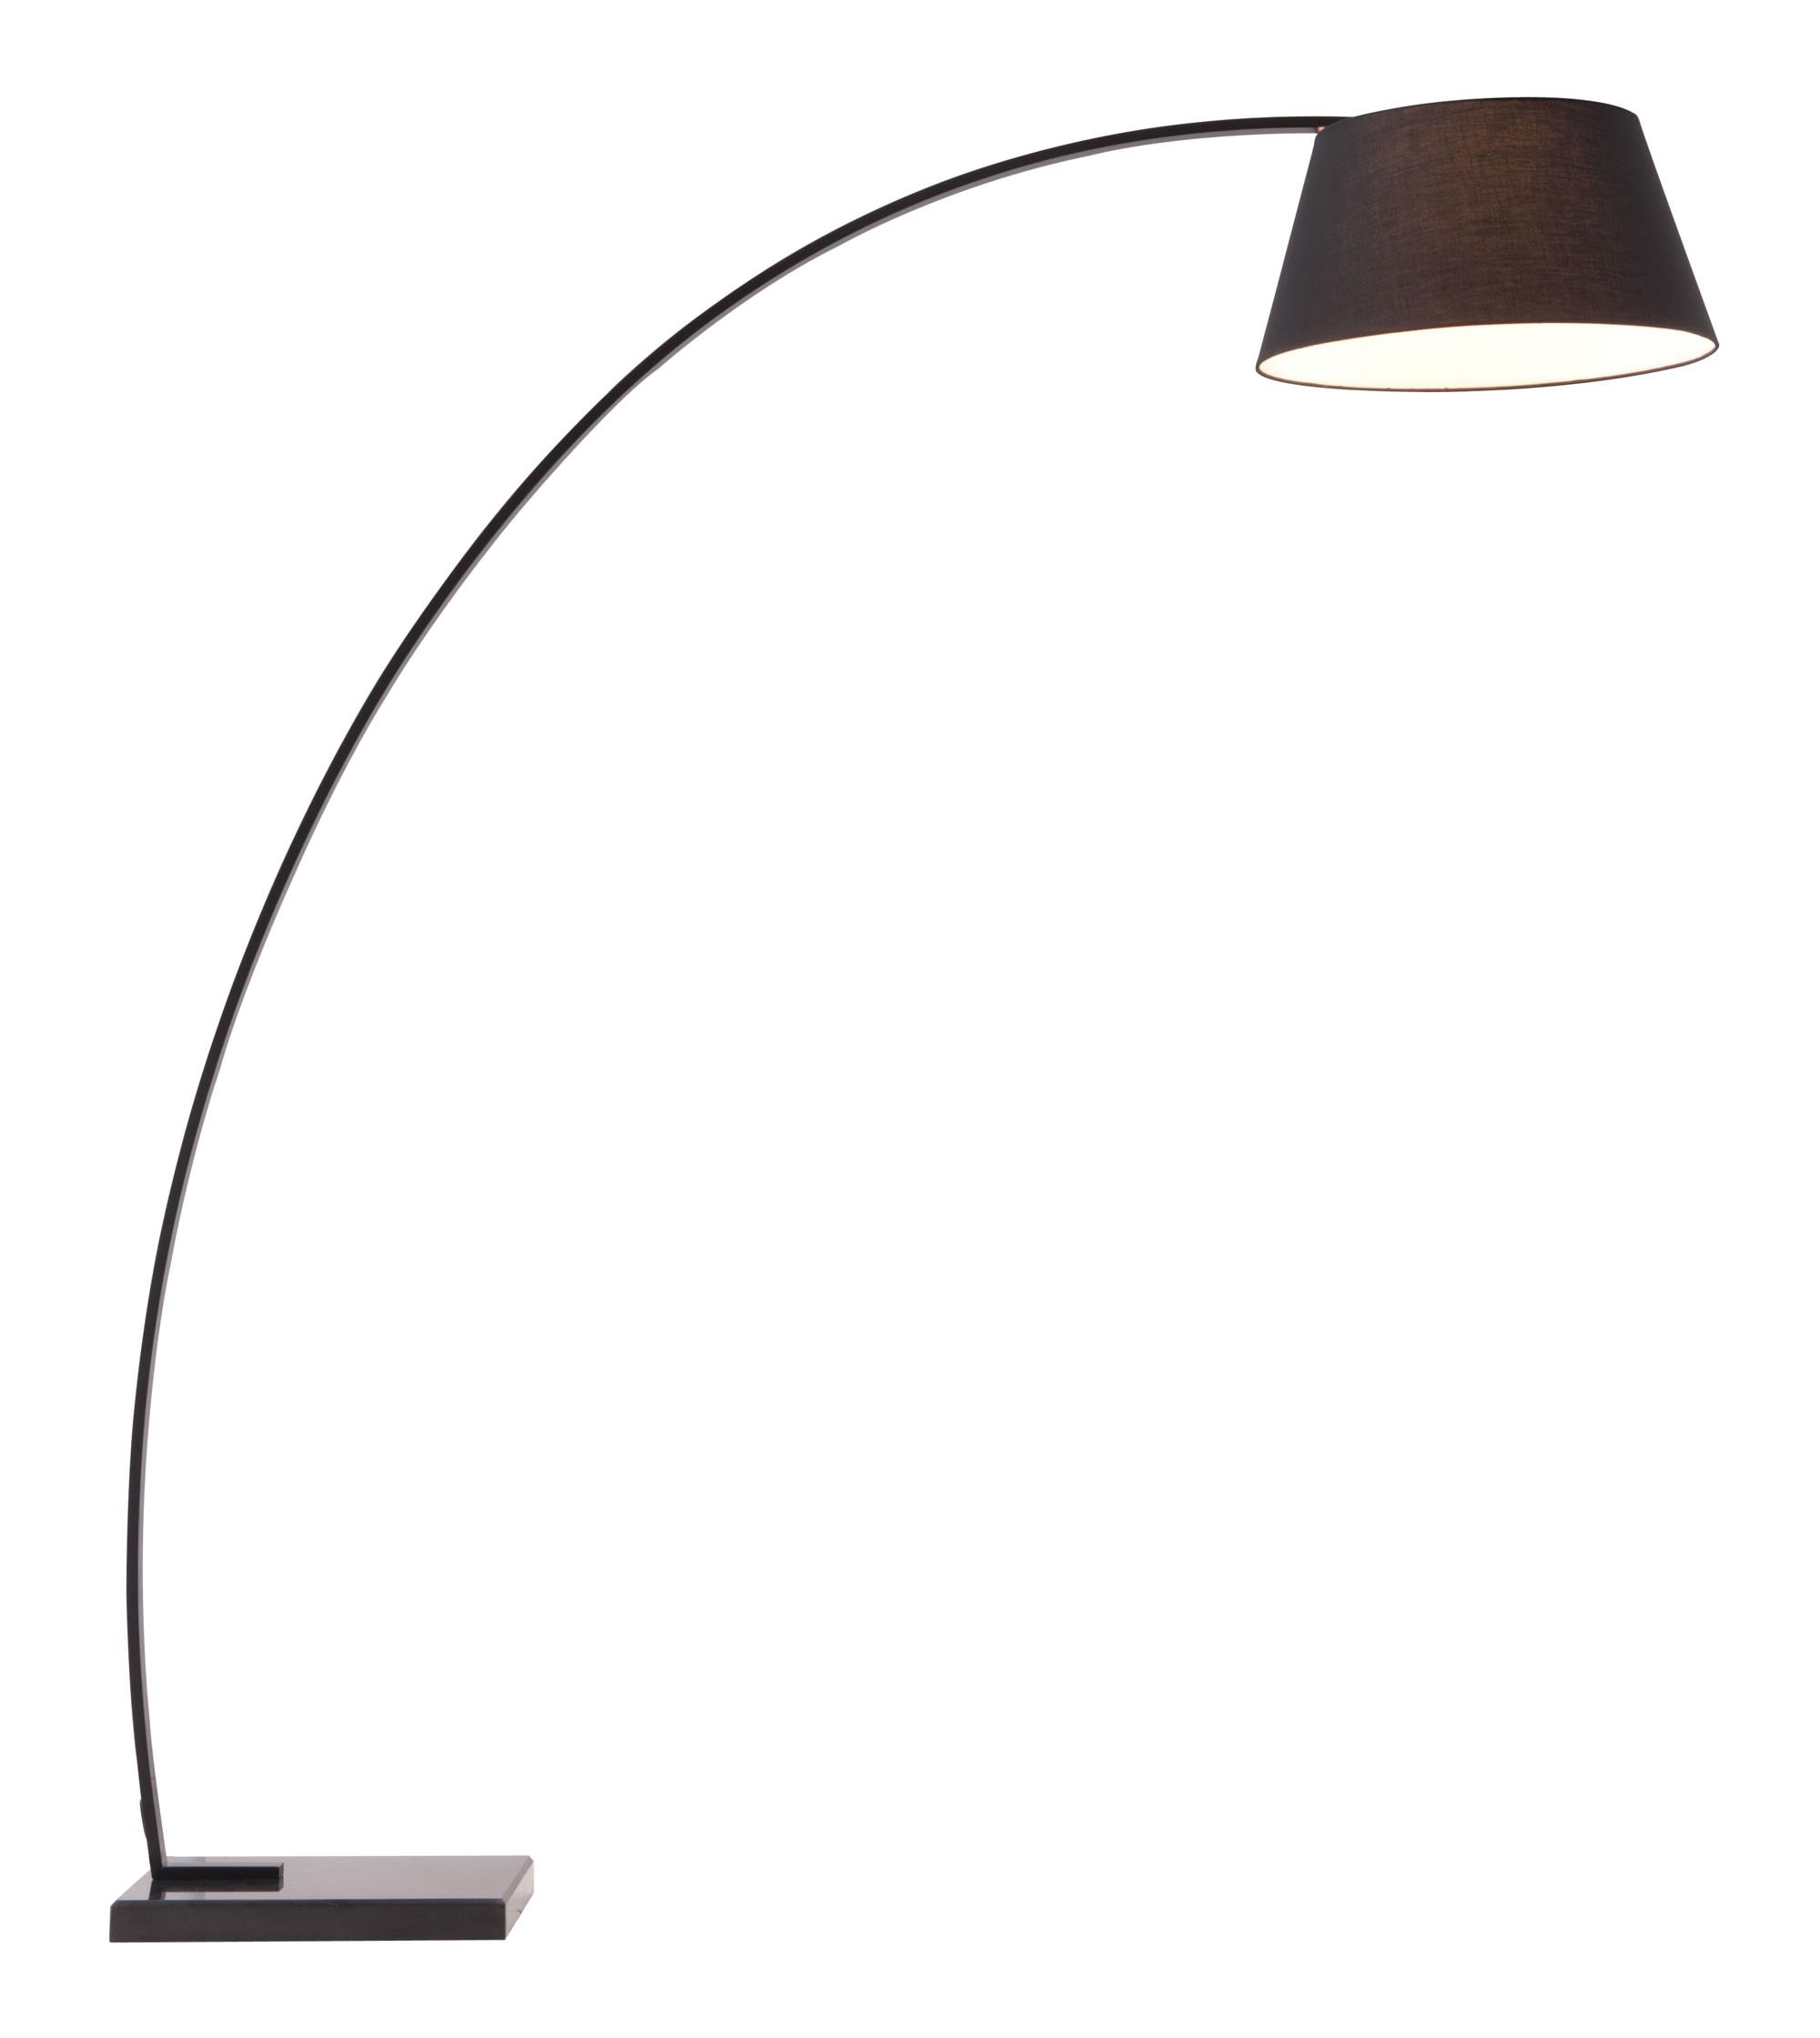 "66.9"" x 19.7"" x 74.8"" Black, Fabric, Metal & Marble, Floor Lamp"